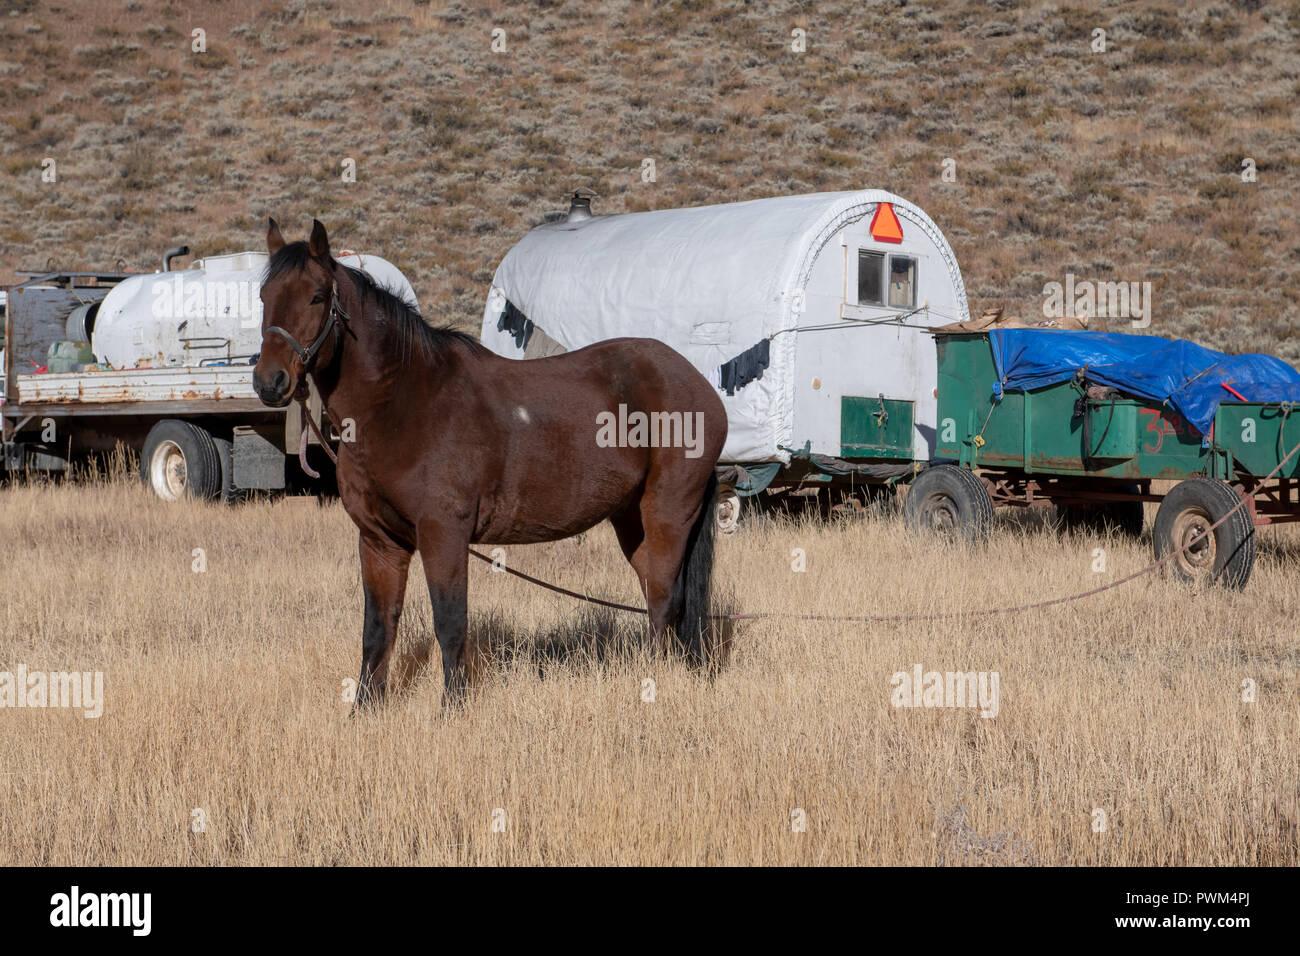 Sheepherder wagon and horse in Idaho - Stock Image